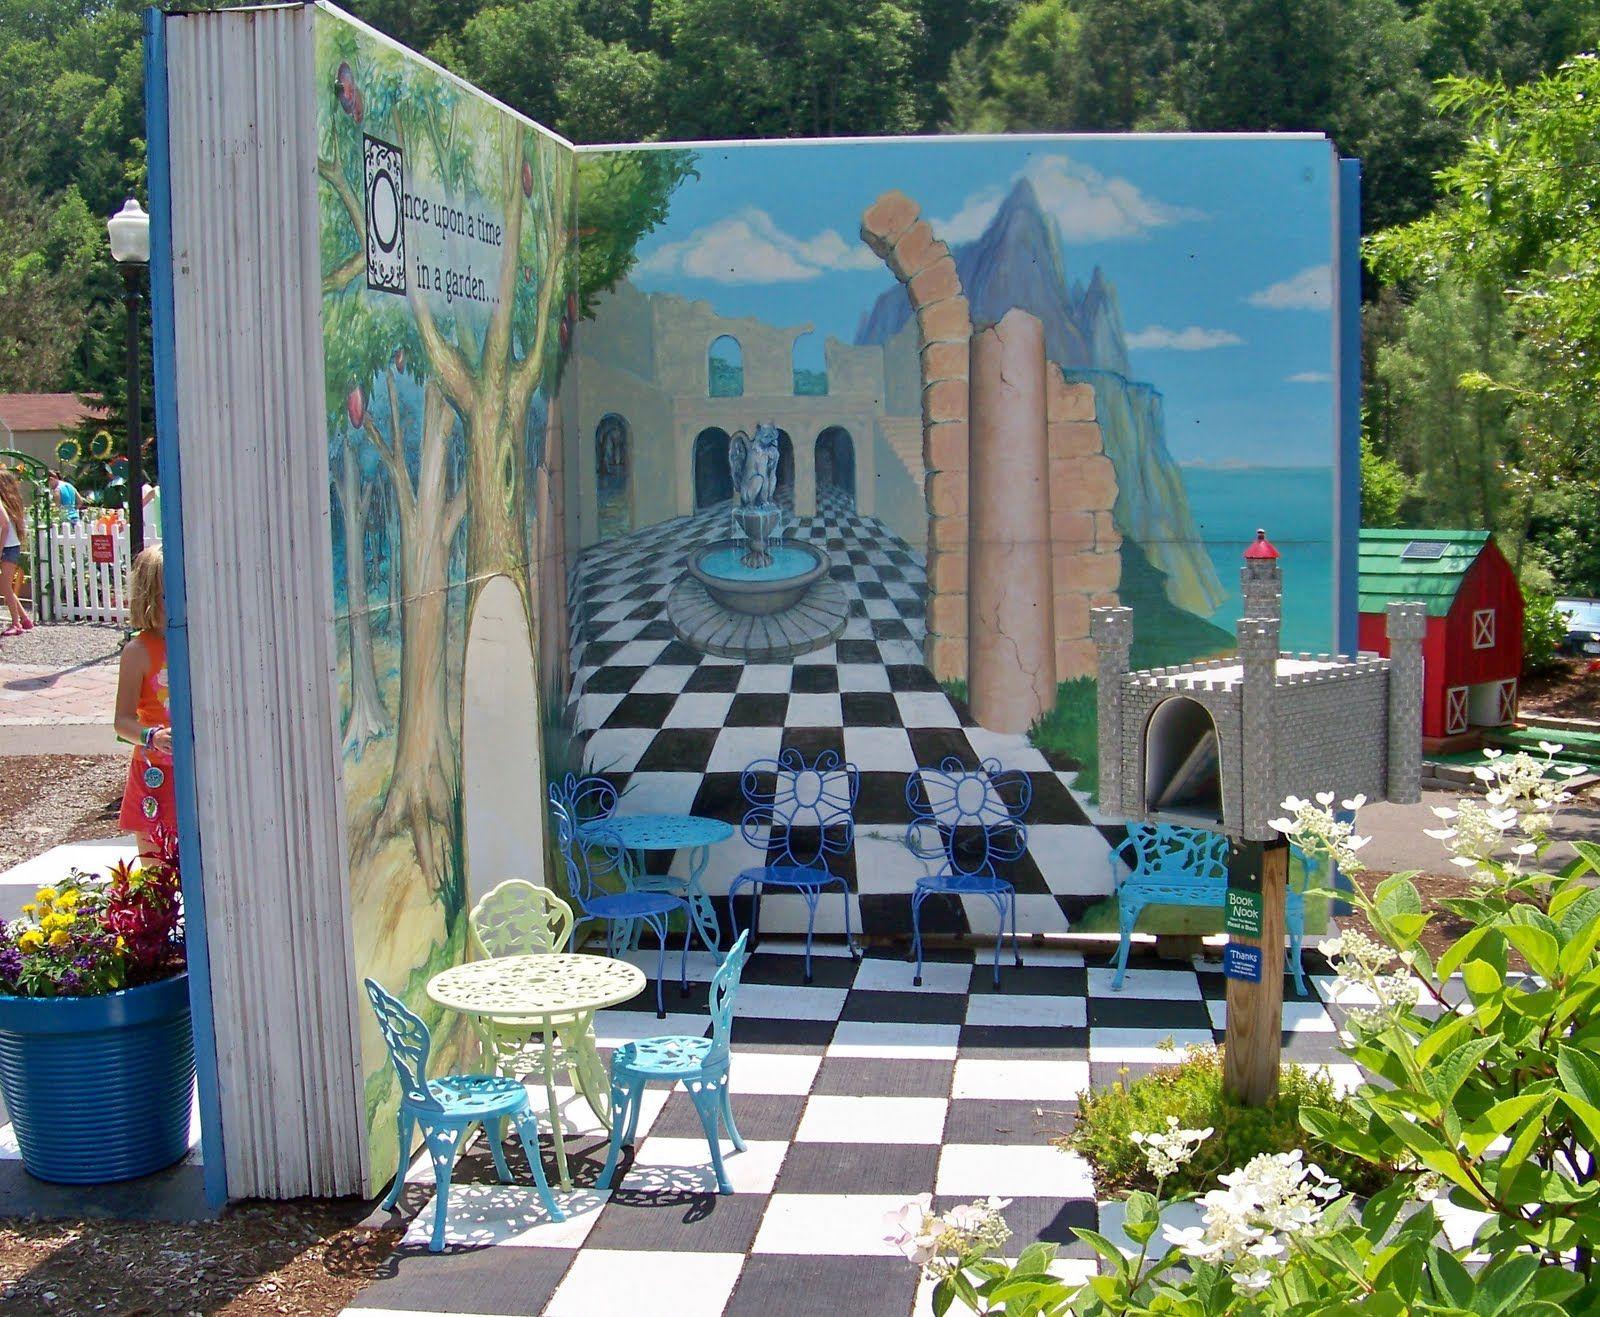 Alice In Wonderland Props | Gallery Of Alice In Wonderland Garden Decor